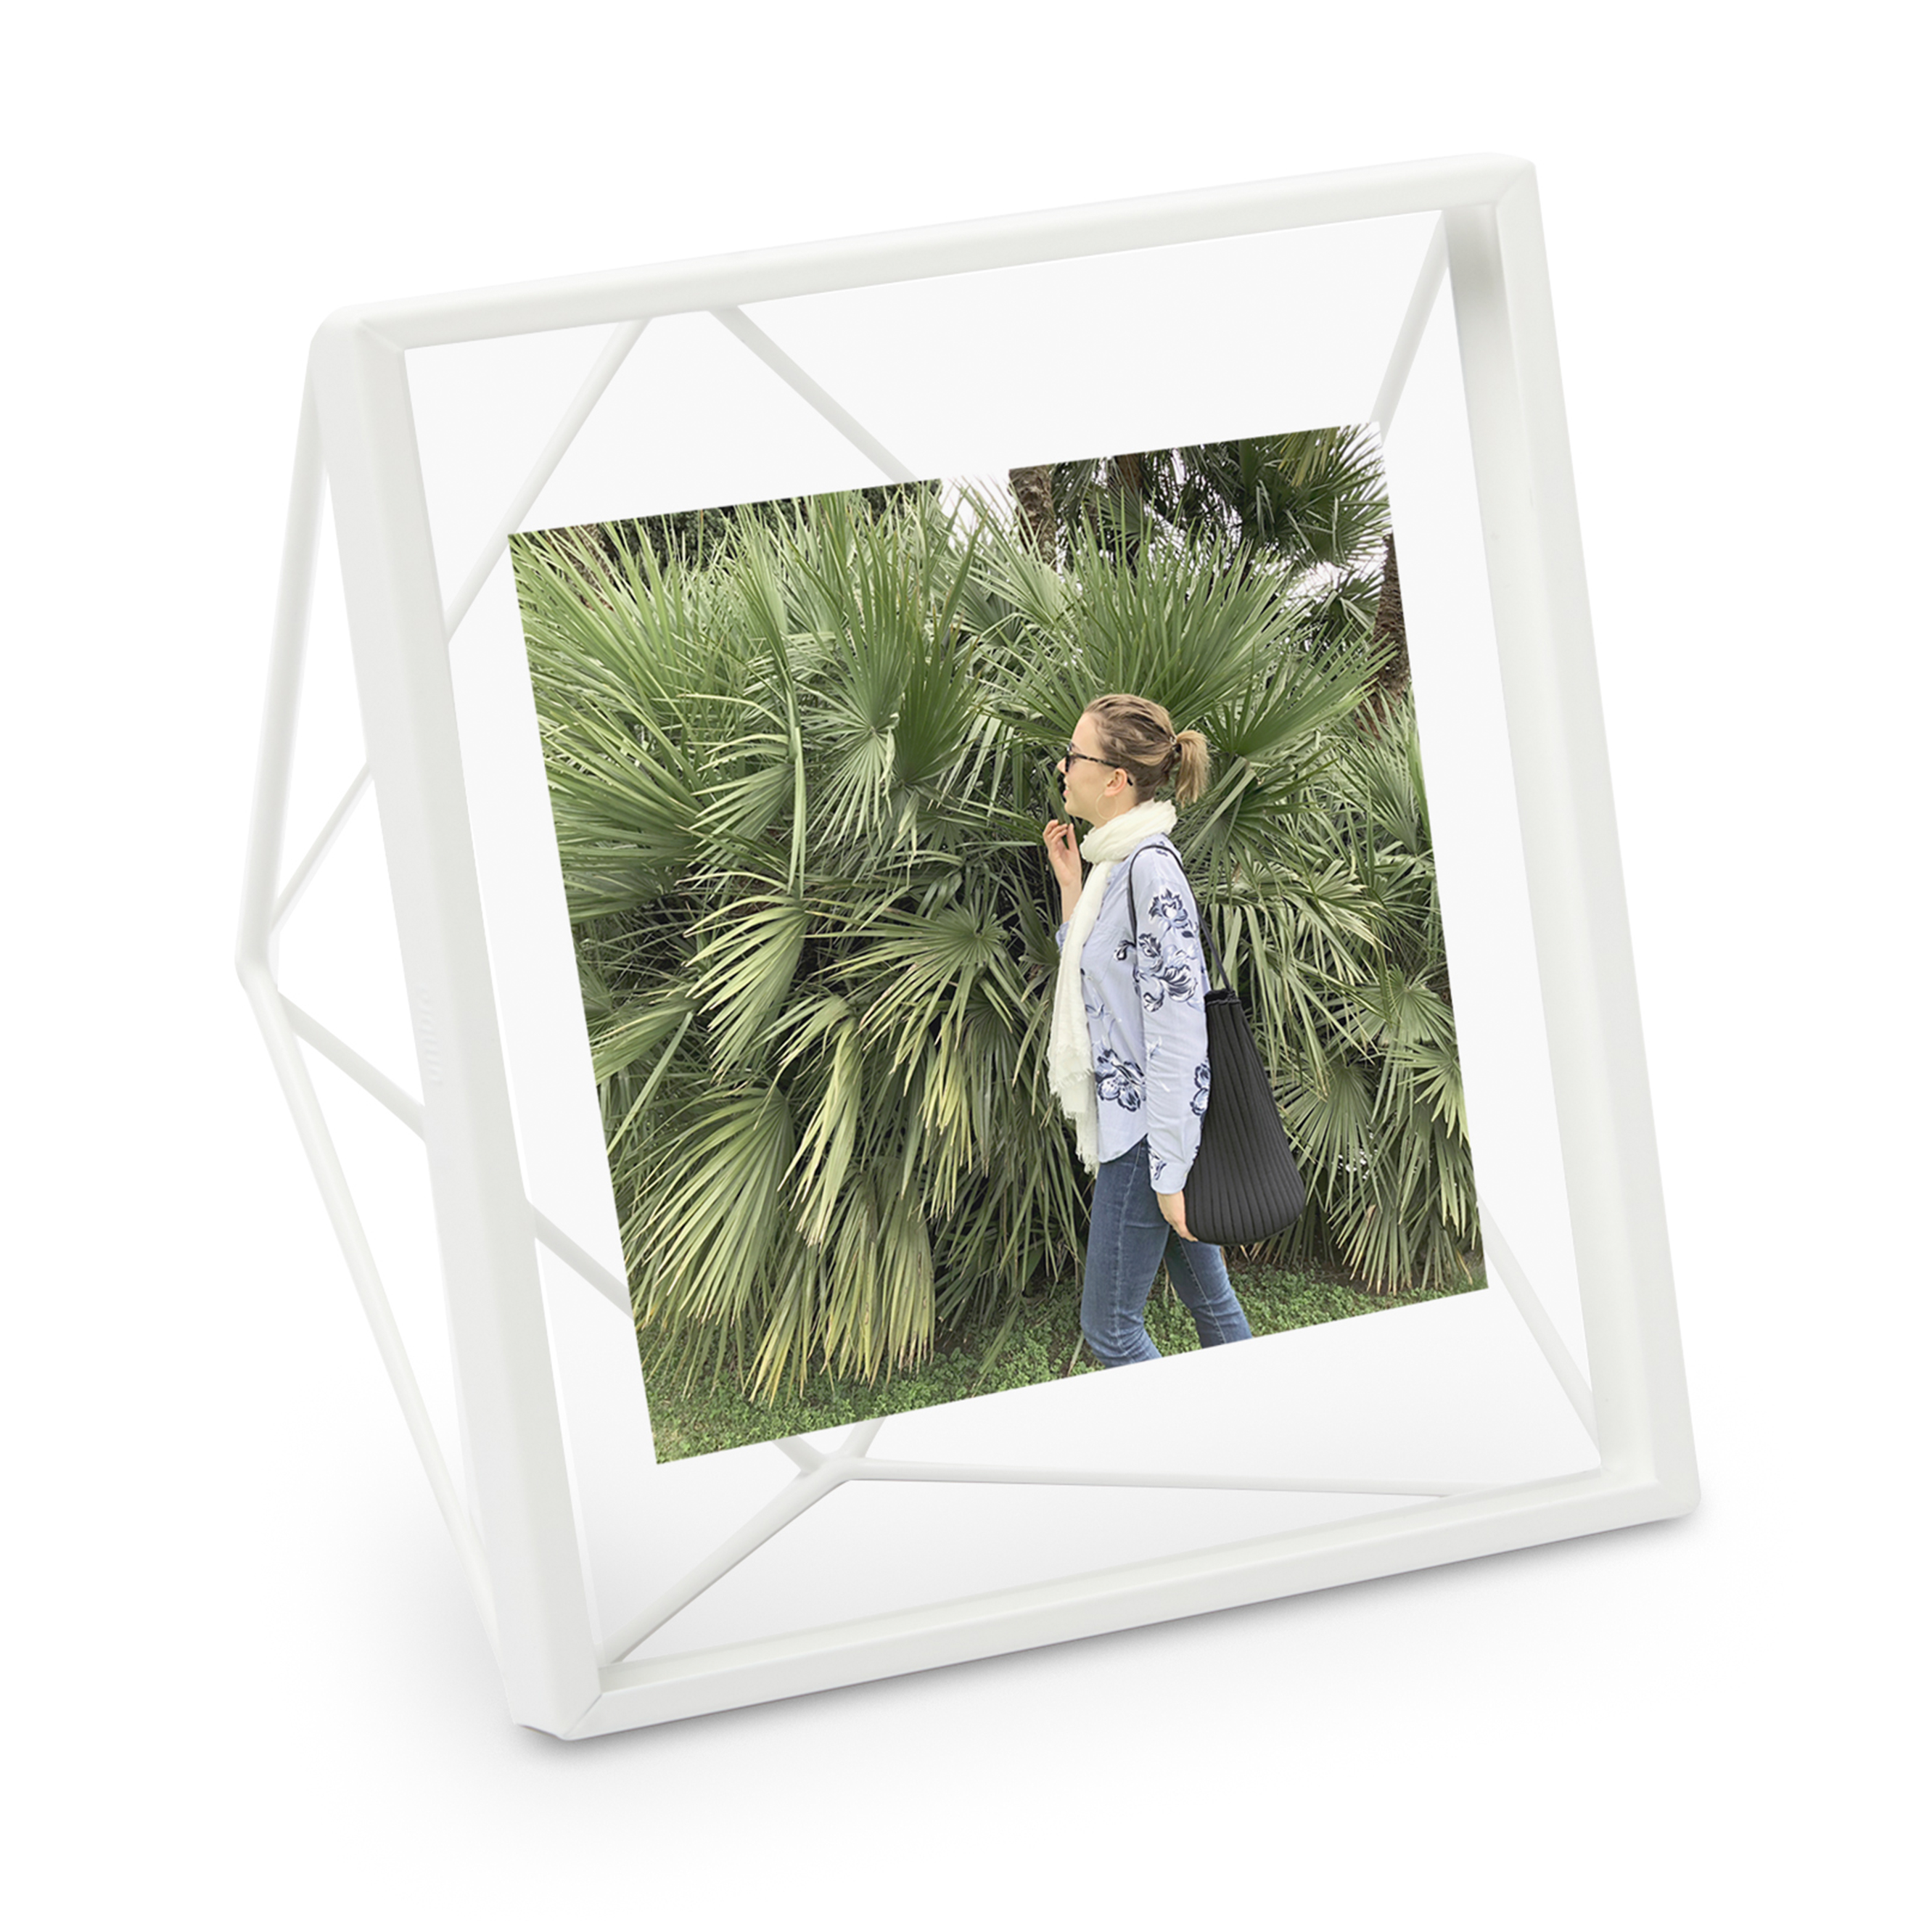 Umbra Prisma Photo Display 10x10cm